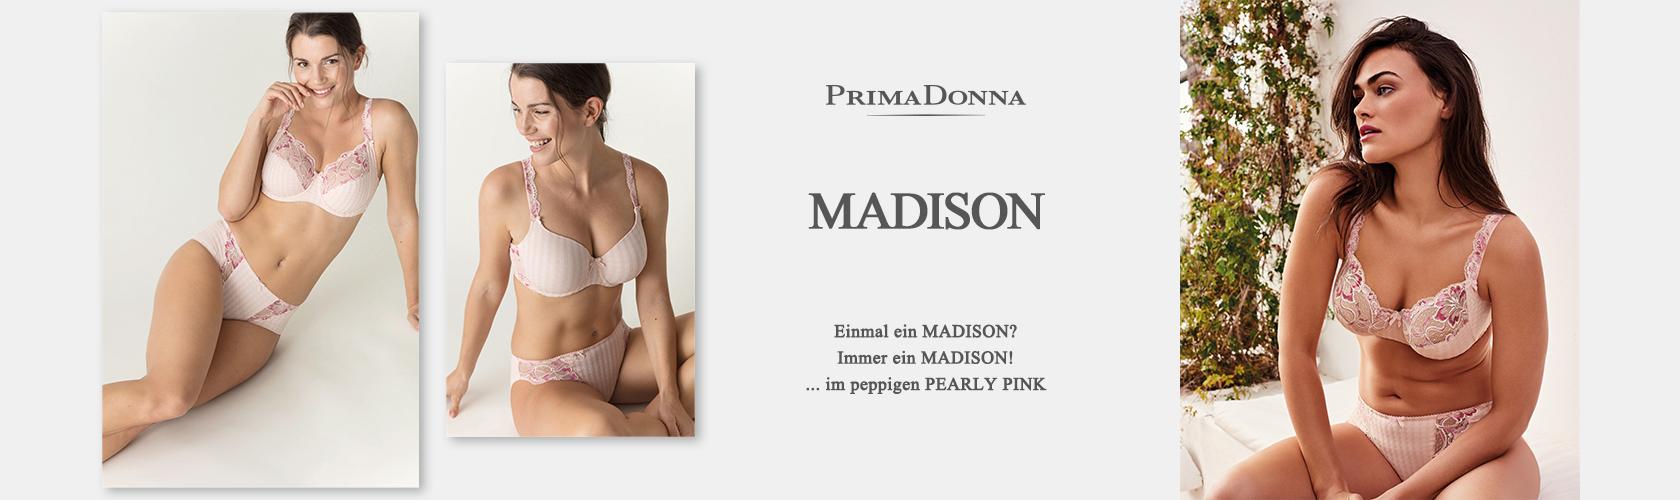 Slideshow MADISON PEP 29.03.